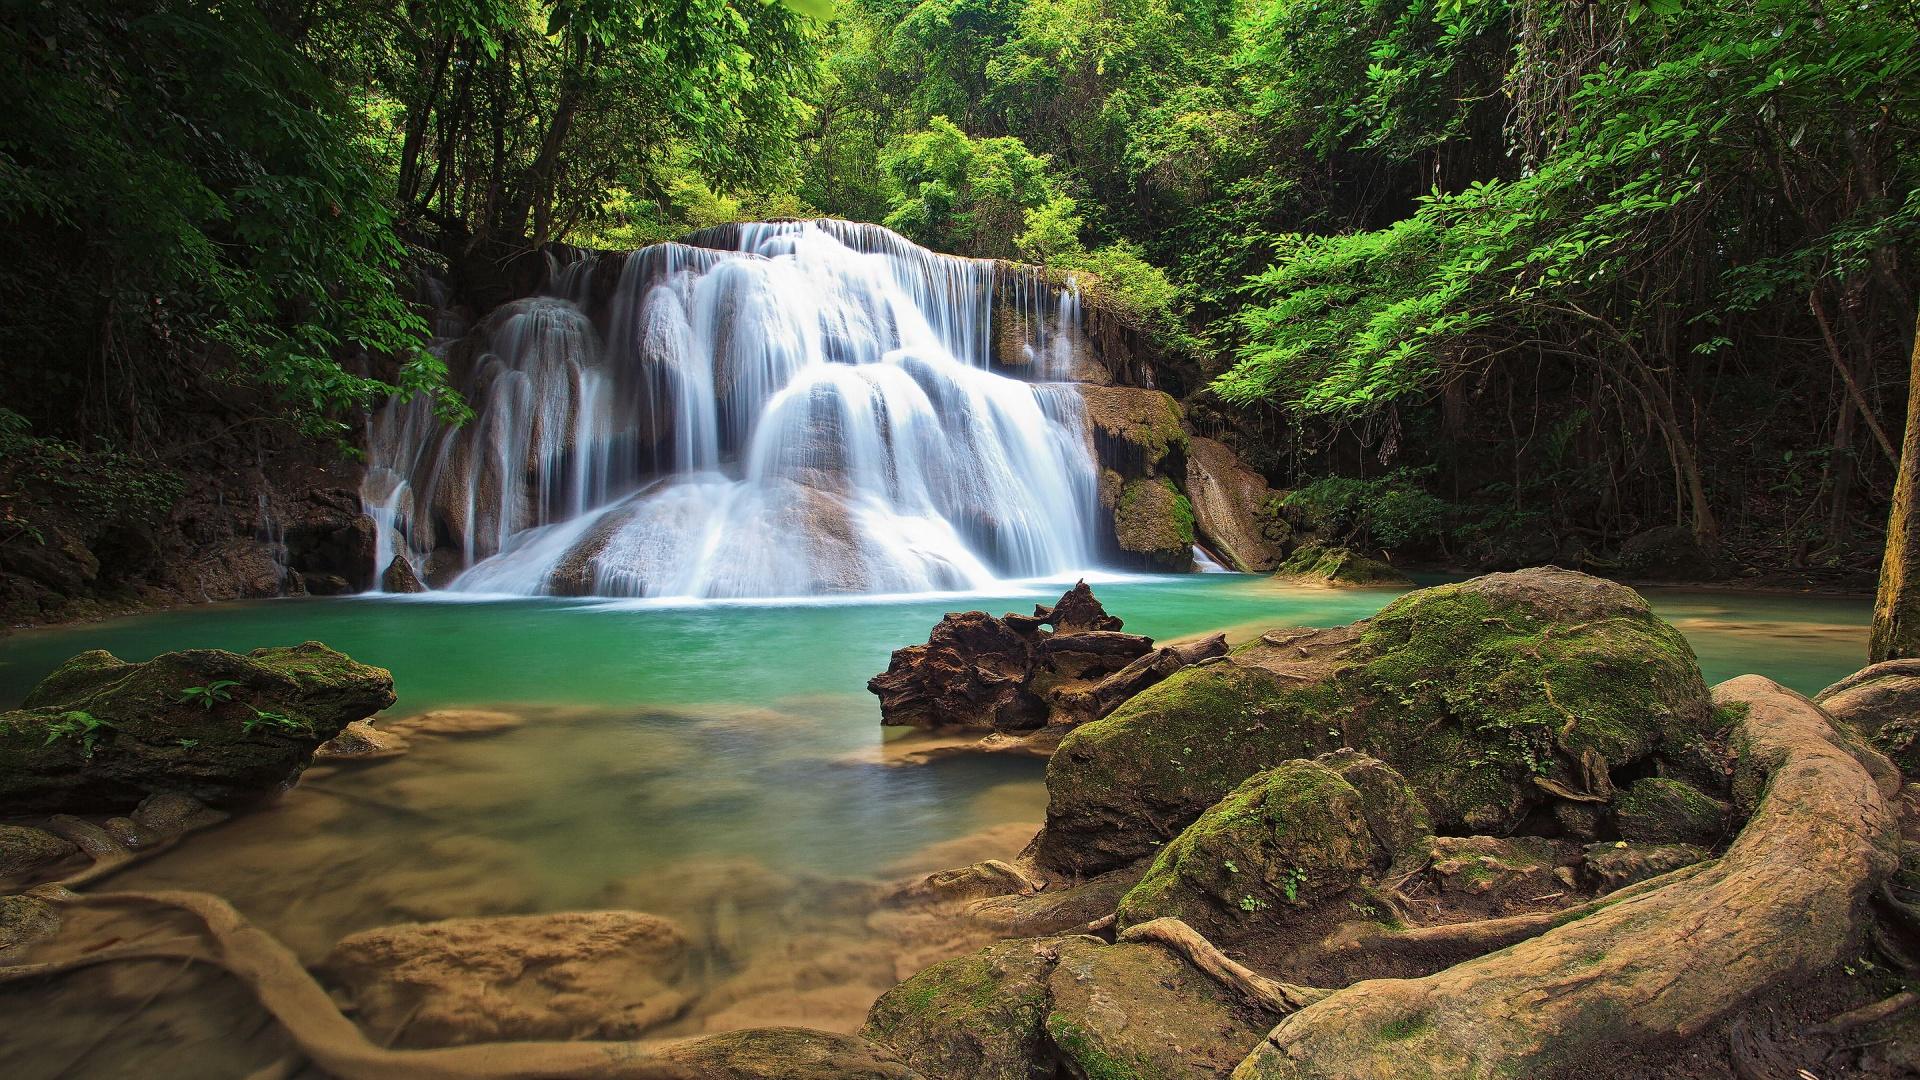 3d Live Waterfall Wallpapers Waterfall Hd 40957 1920x1080 Px Hdwallsource Com